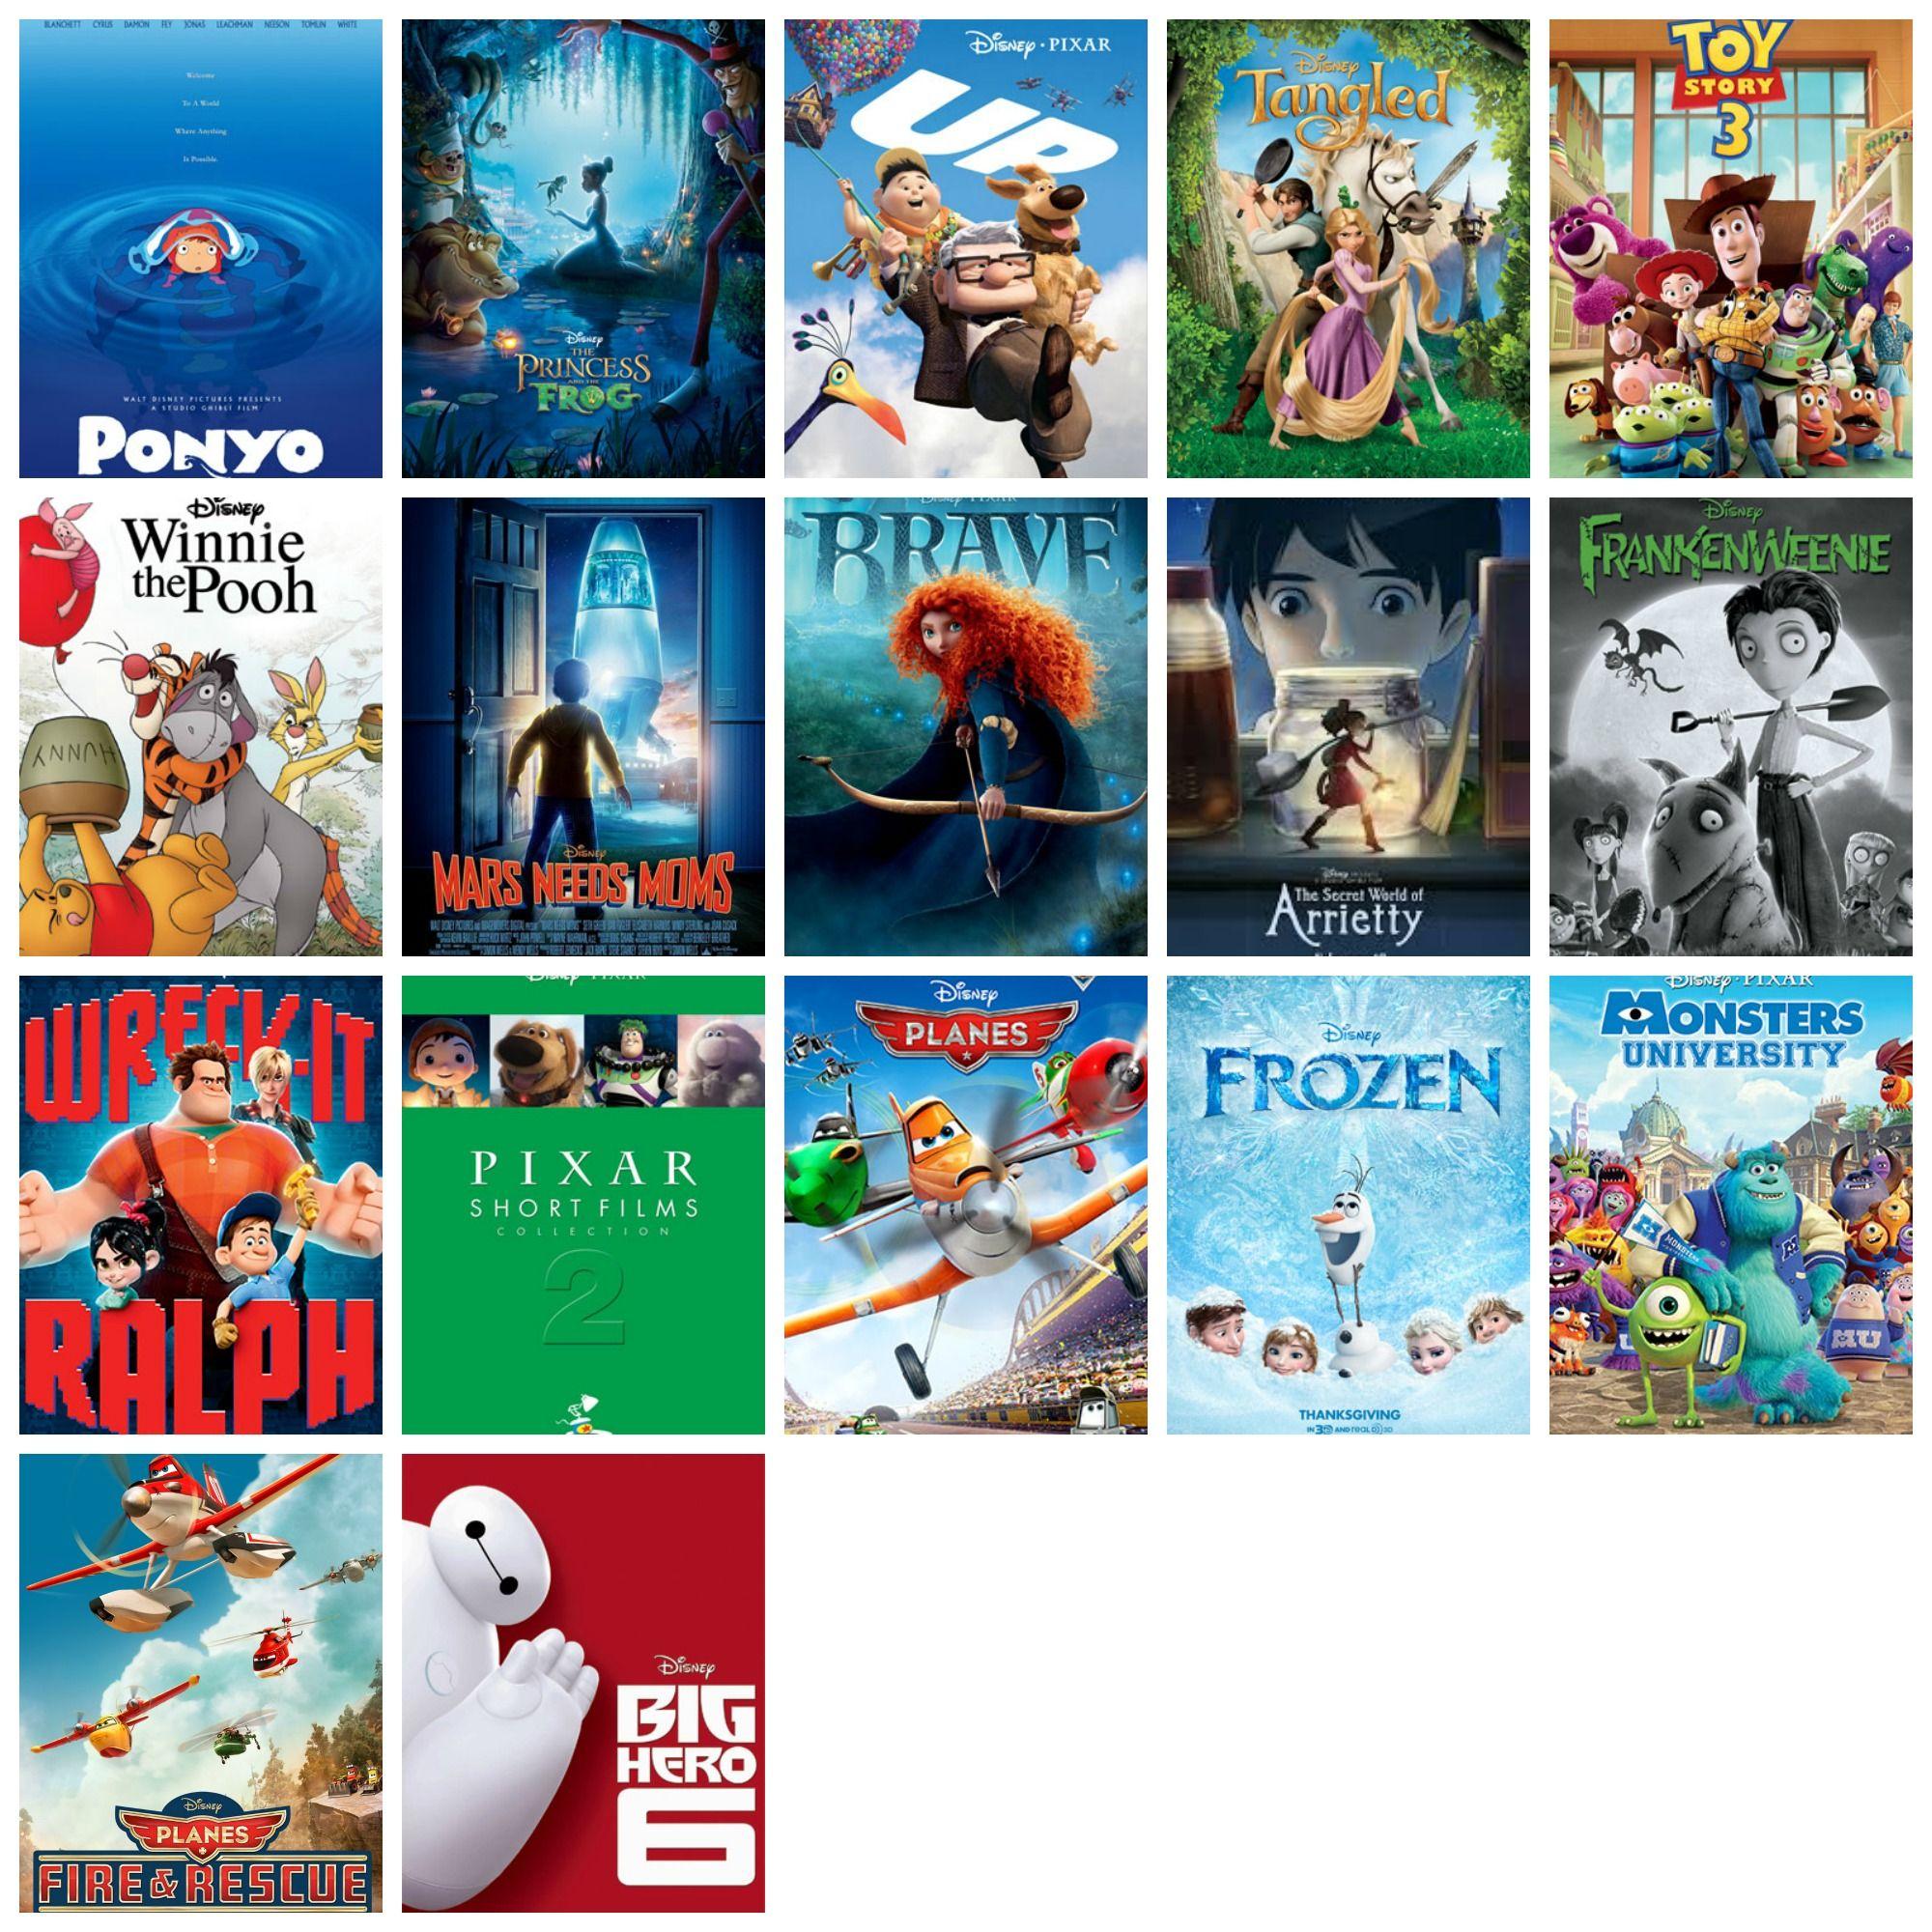 2009-2014 Disney Movies In Order Of Release.